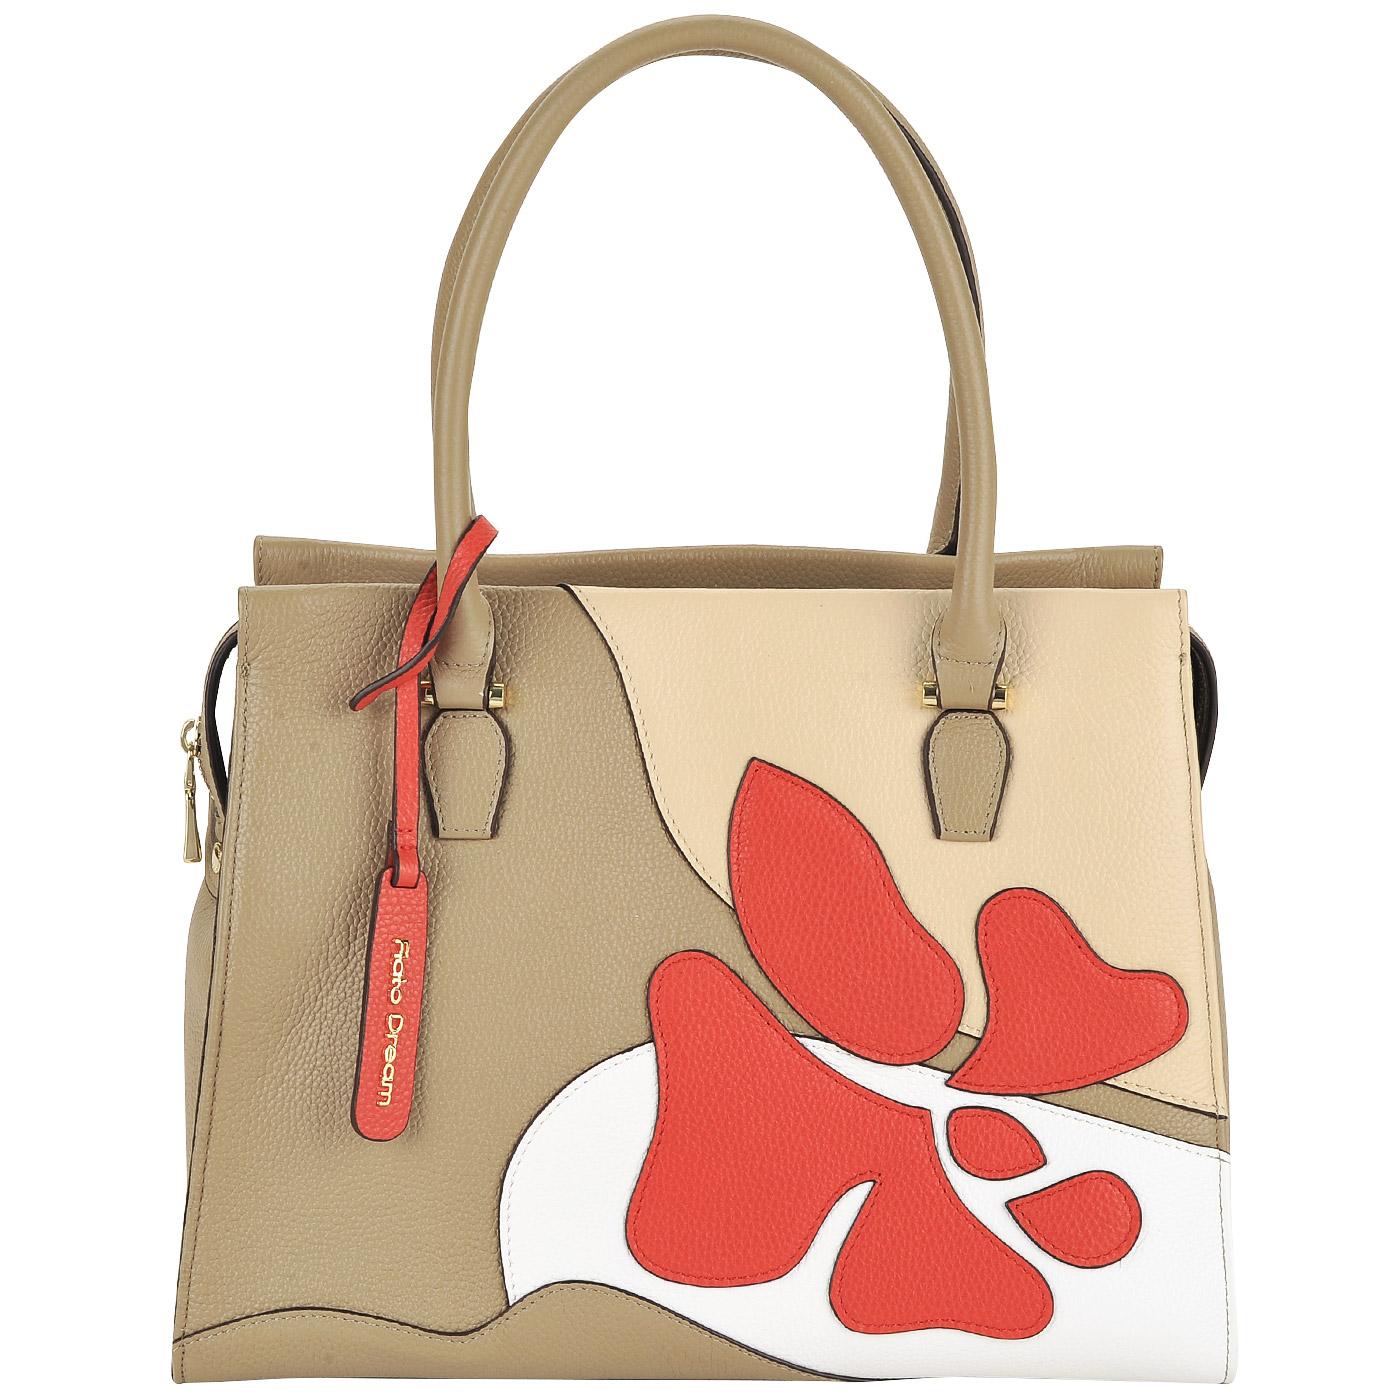 0bf1a4702968 Кожаная сумка с принтом Fiato Dream Кожаная сумка с принтом Fiato Dream ...